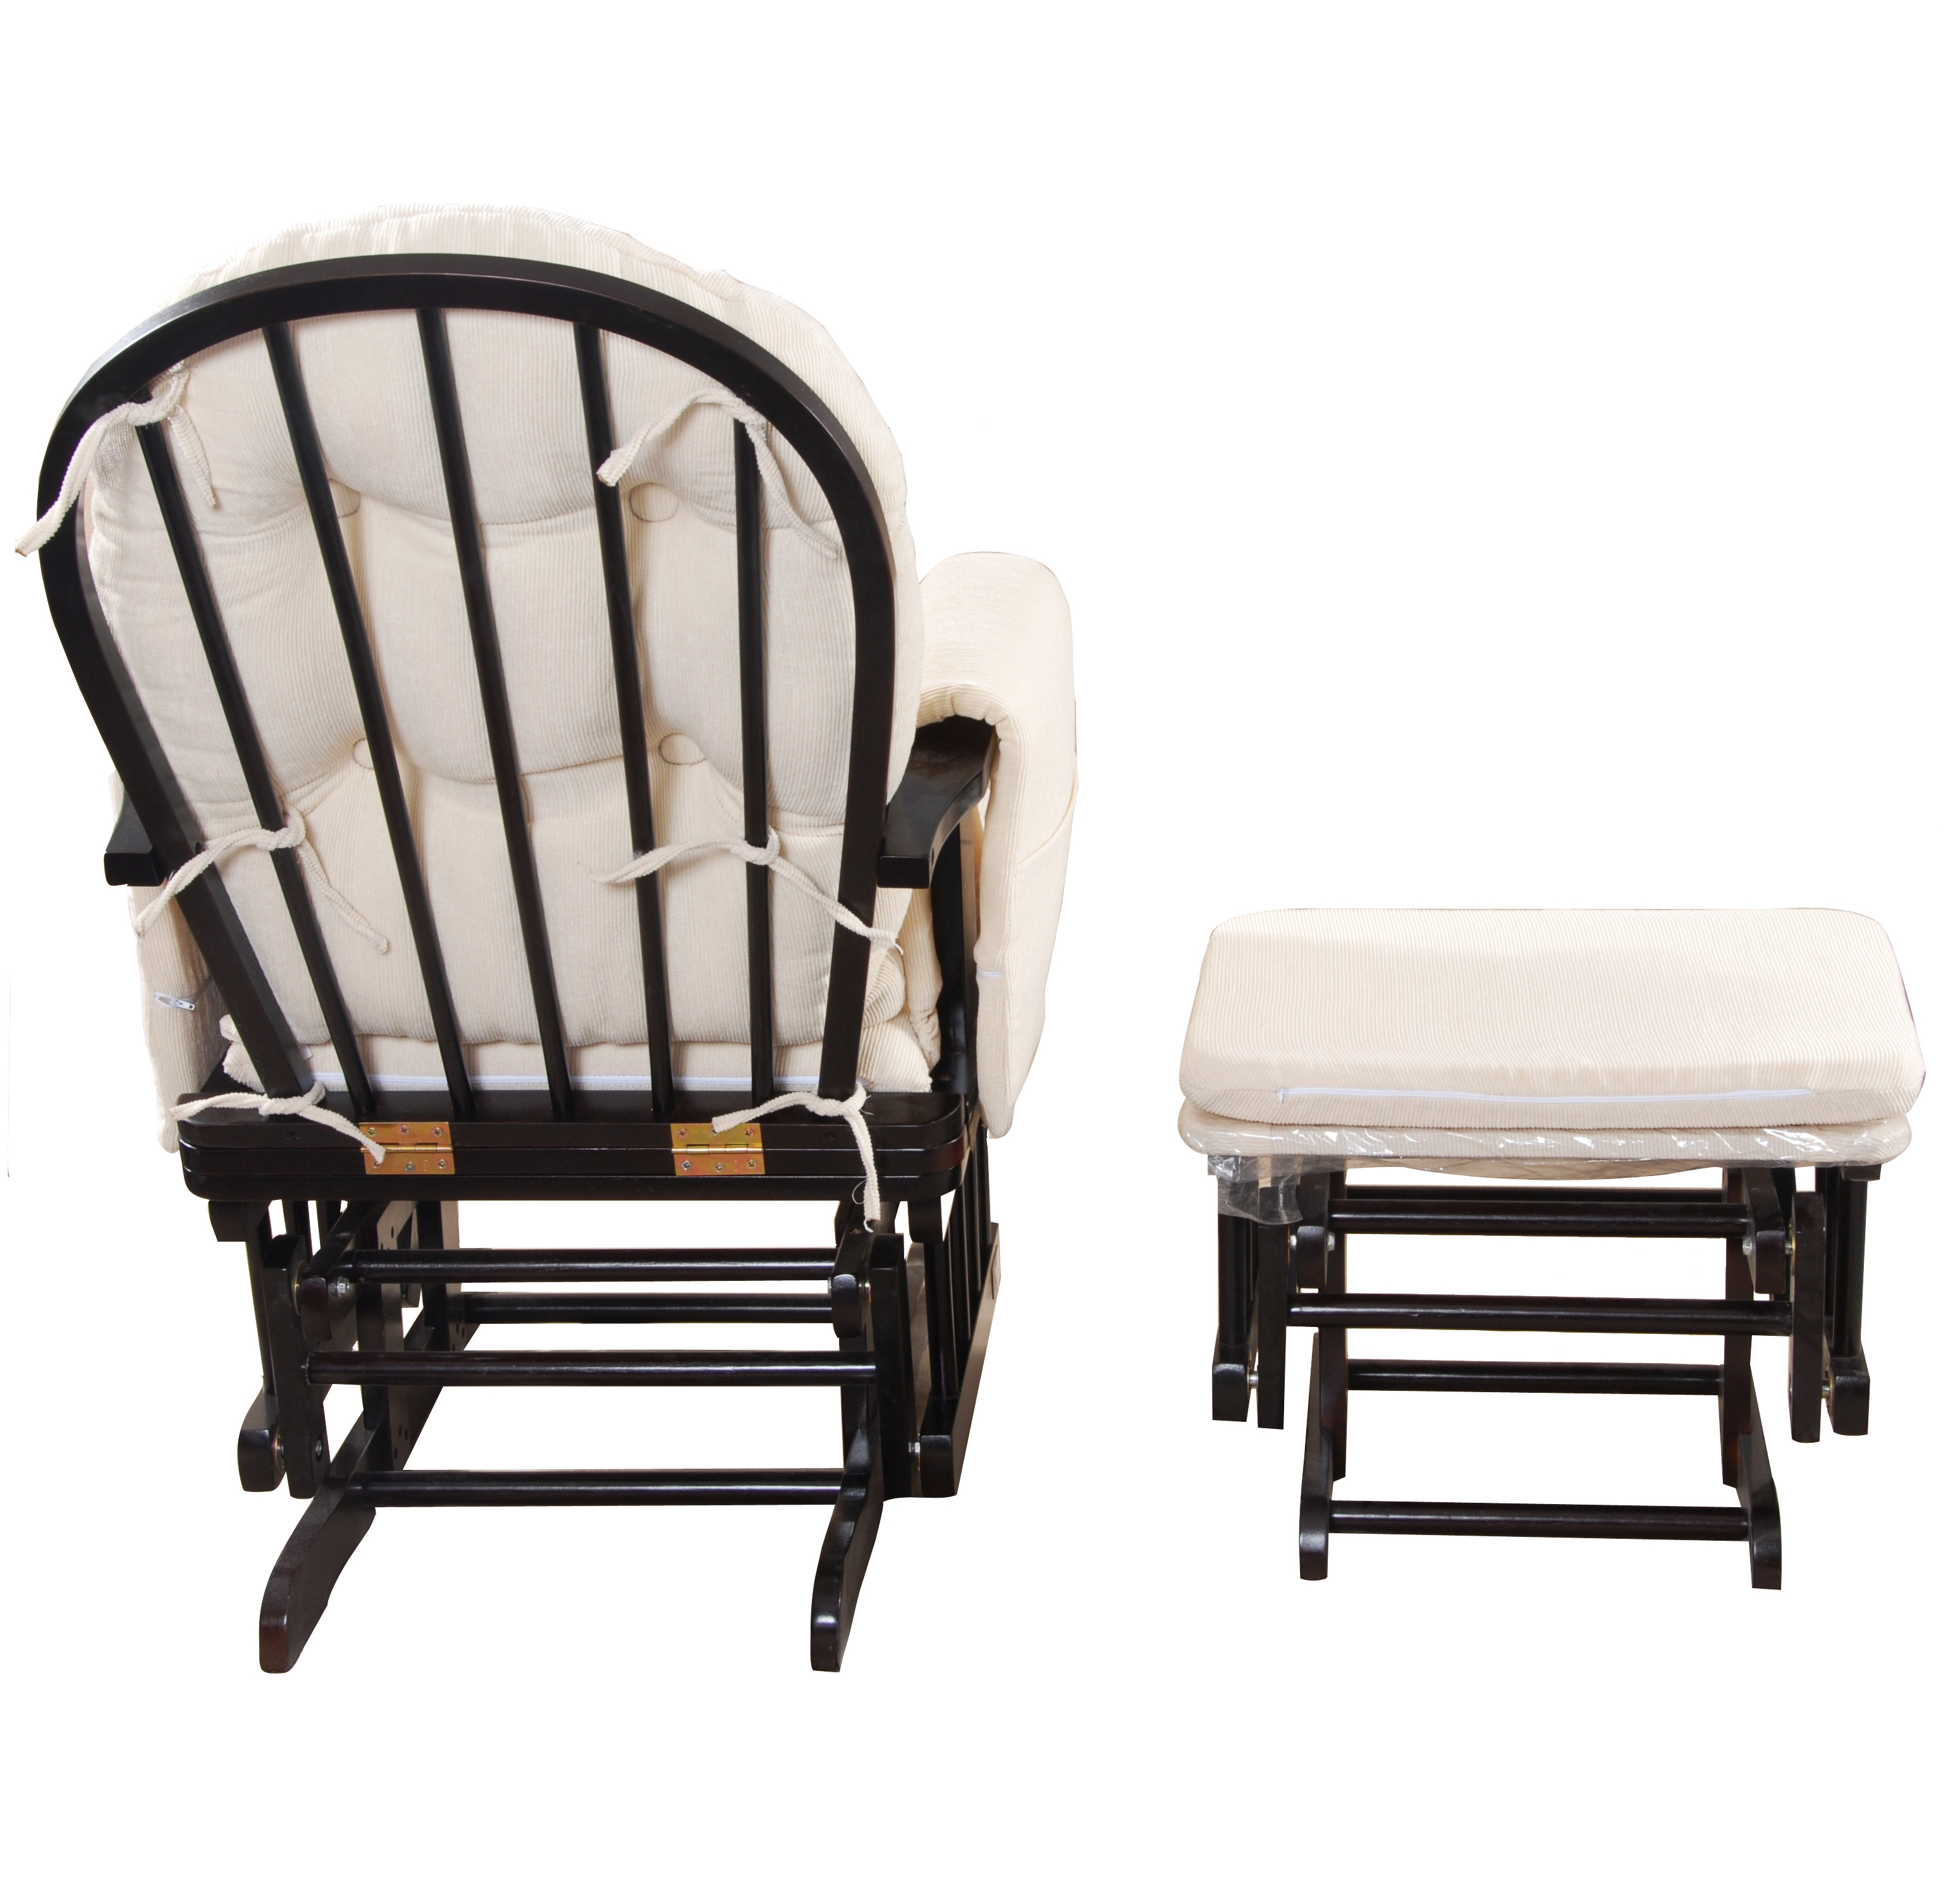 Brand New Baby Glider Chair Rocking Chair Breast Feeding